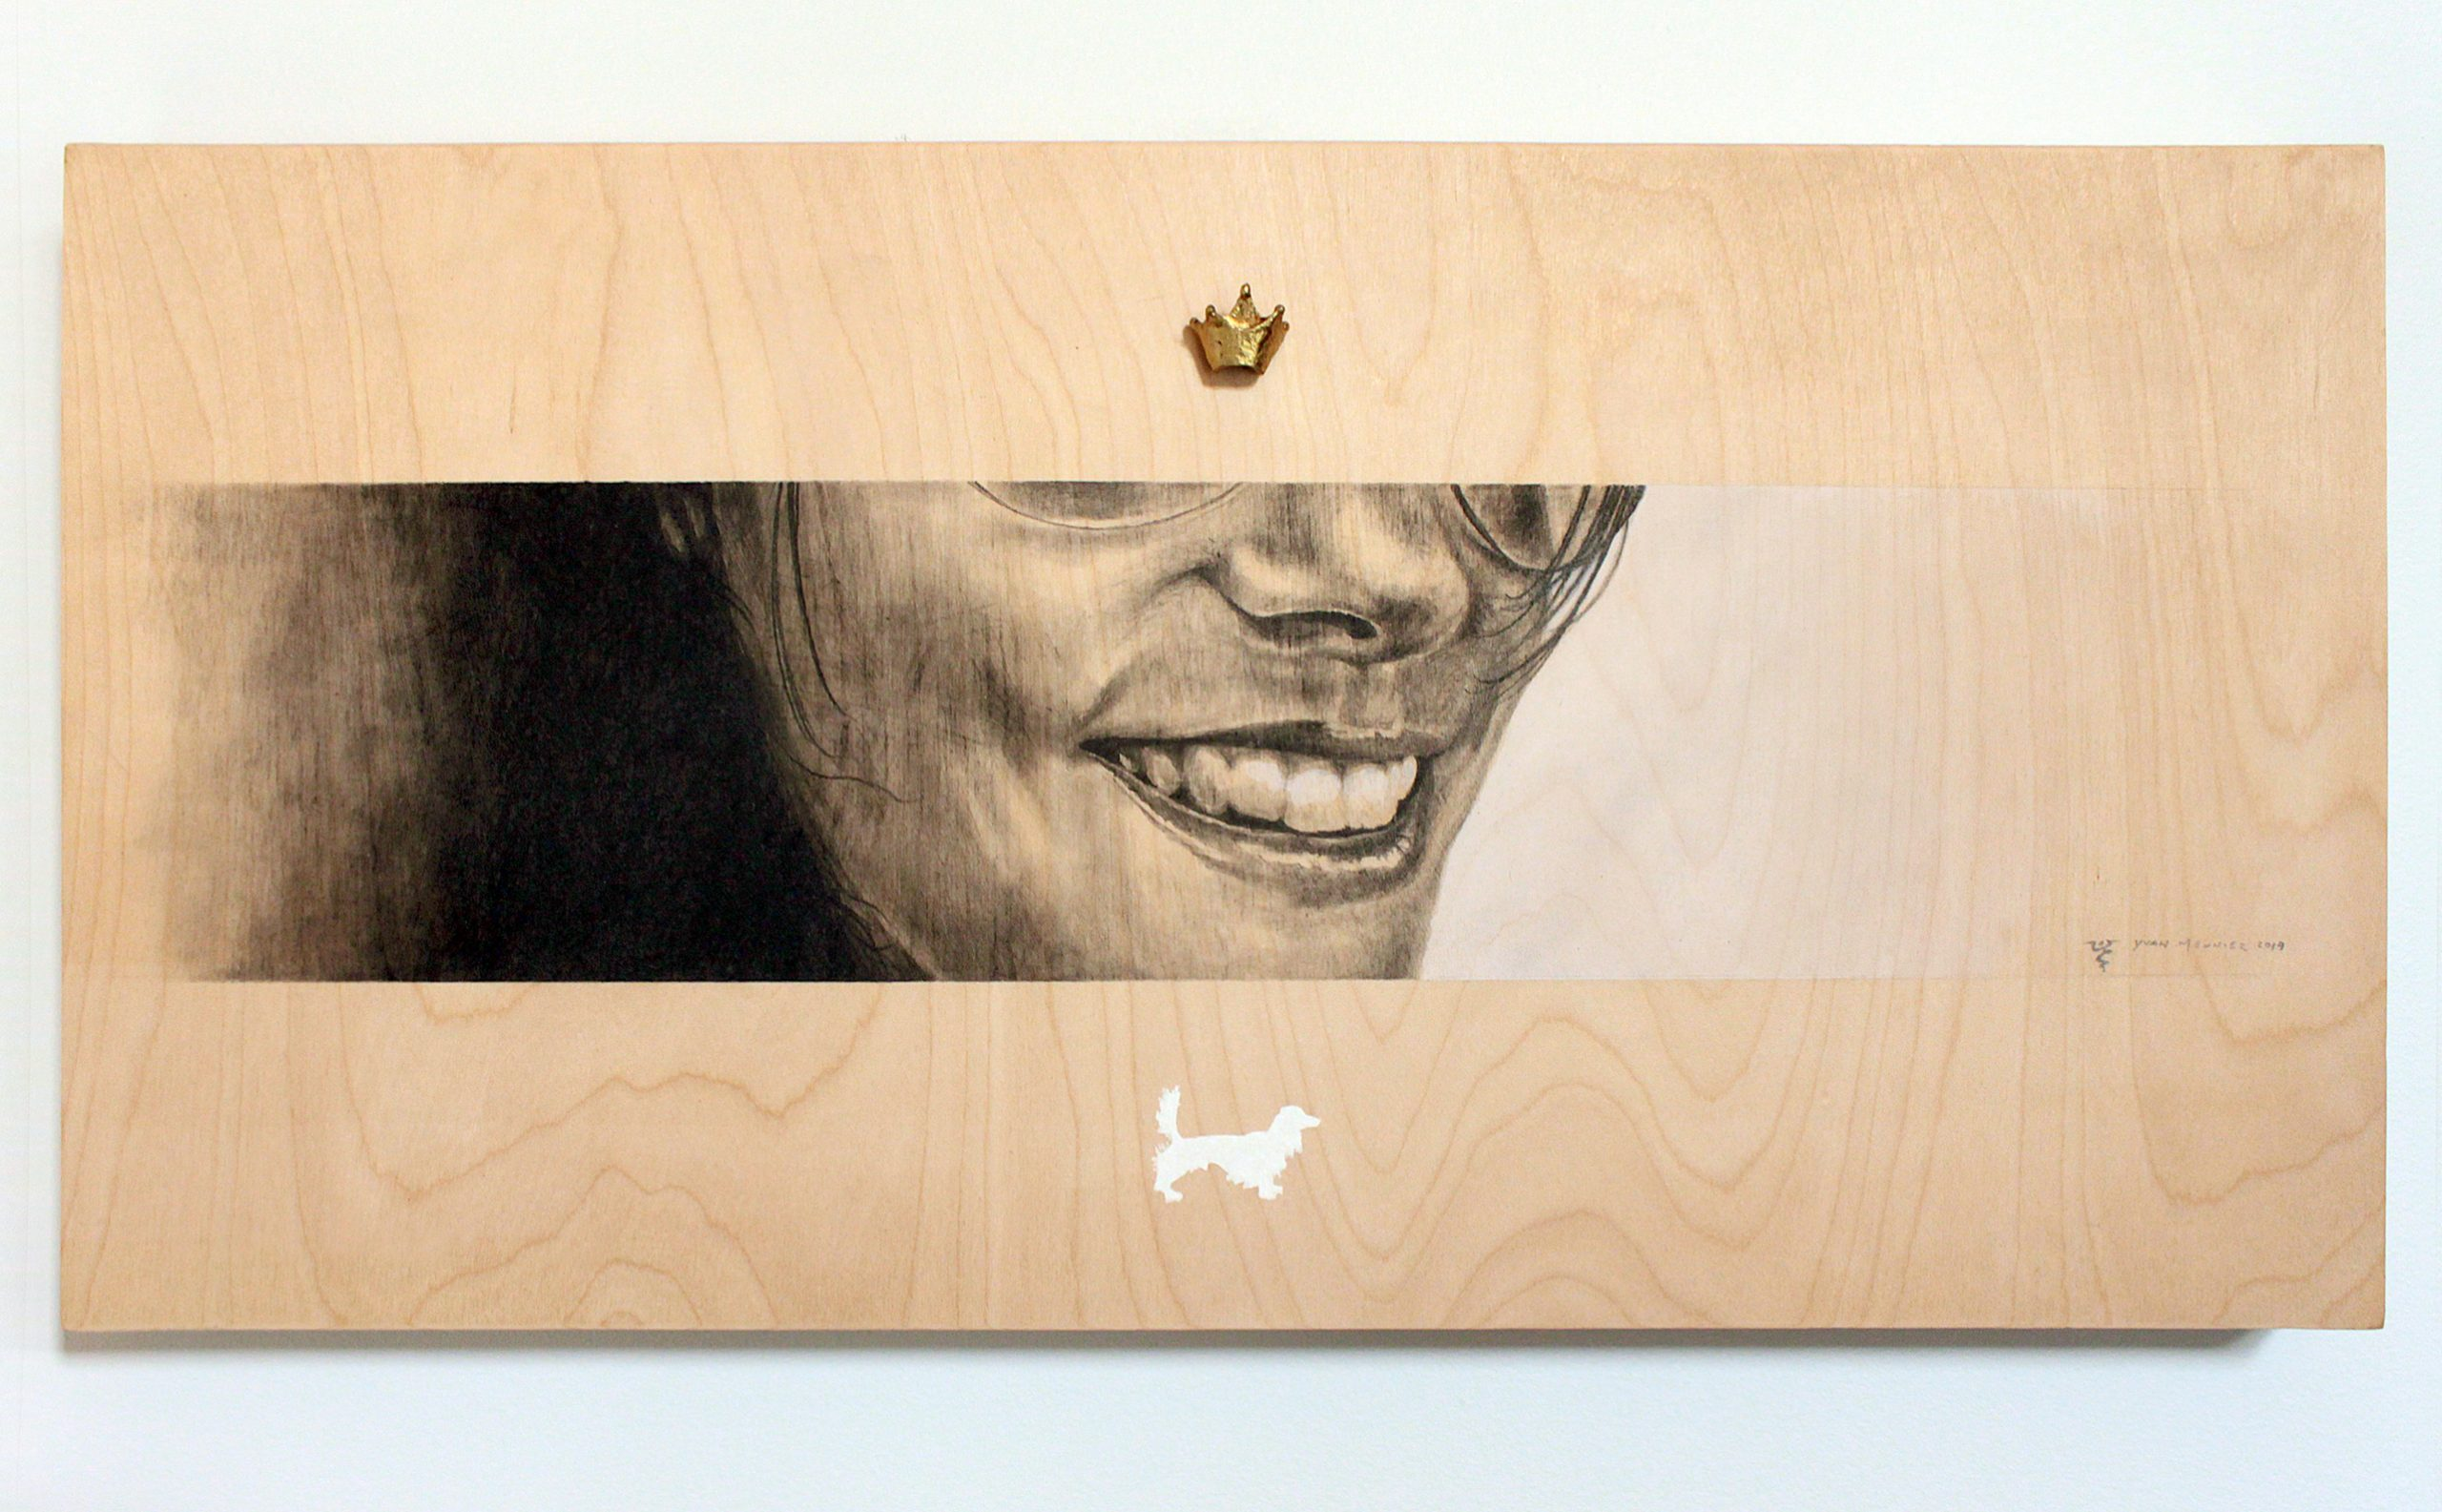 Crayonné sur bois | Crayon on wooden board